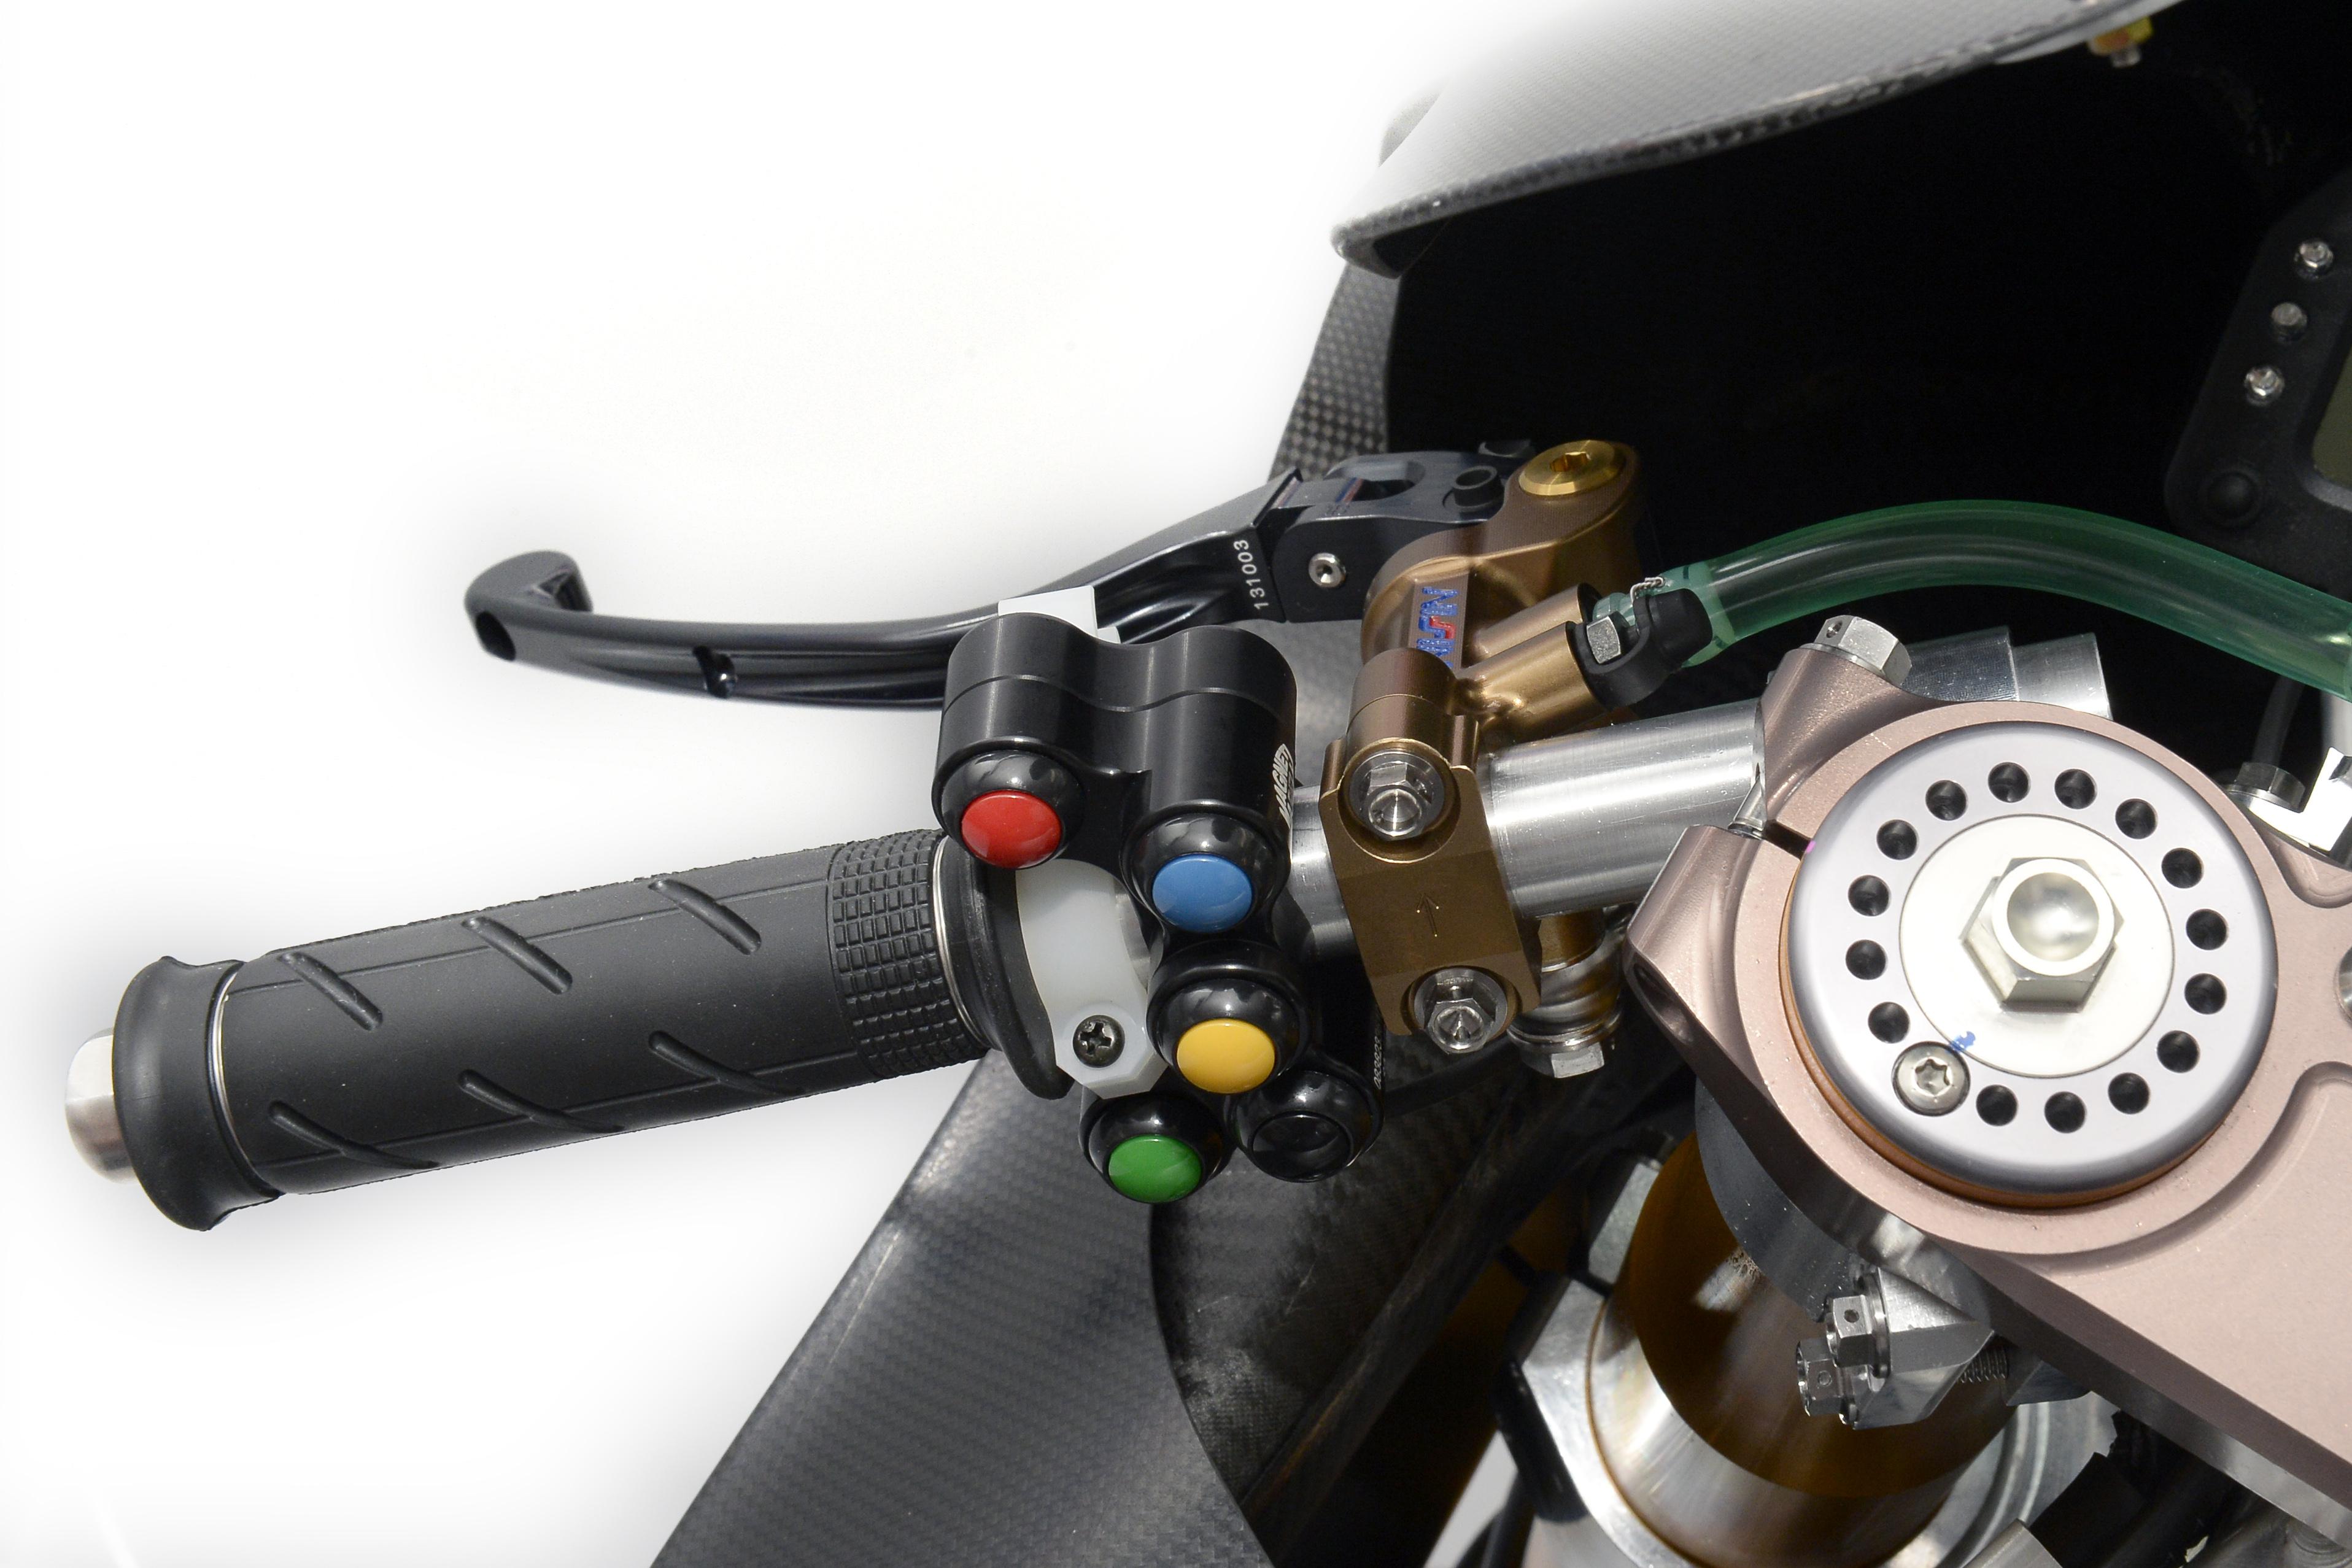 honda_rcv1000r_motogp_production_racer_www_racemoto_com_006